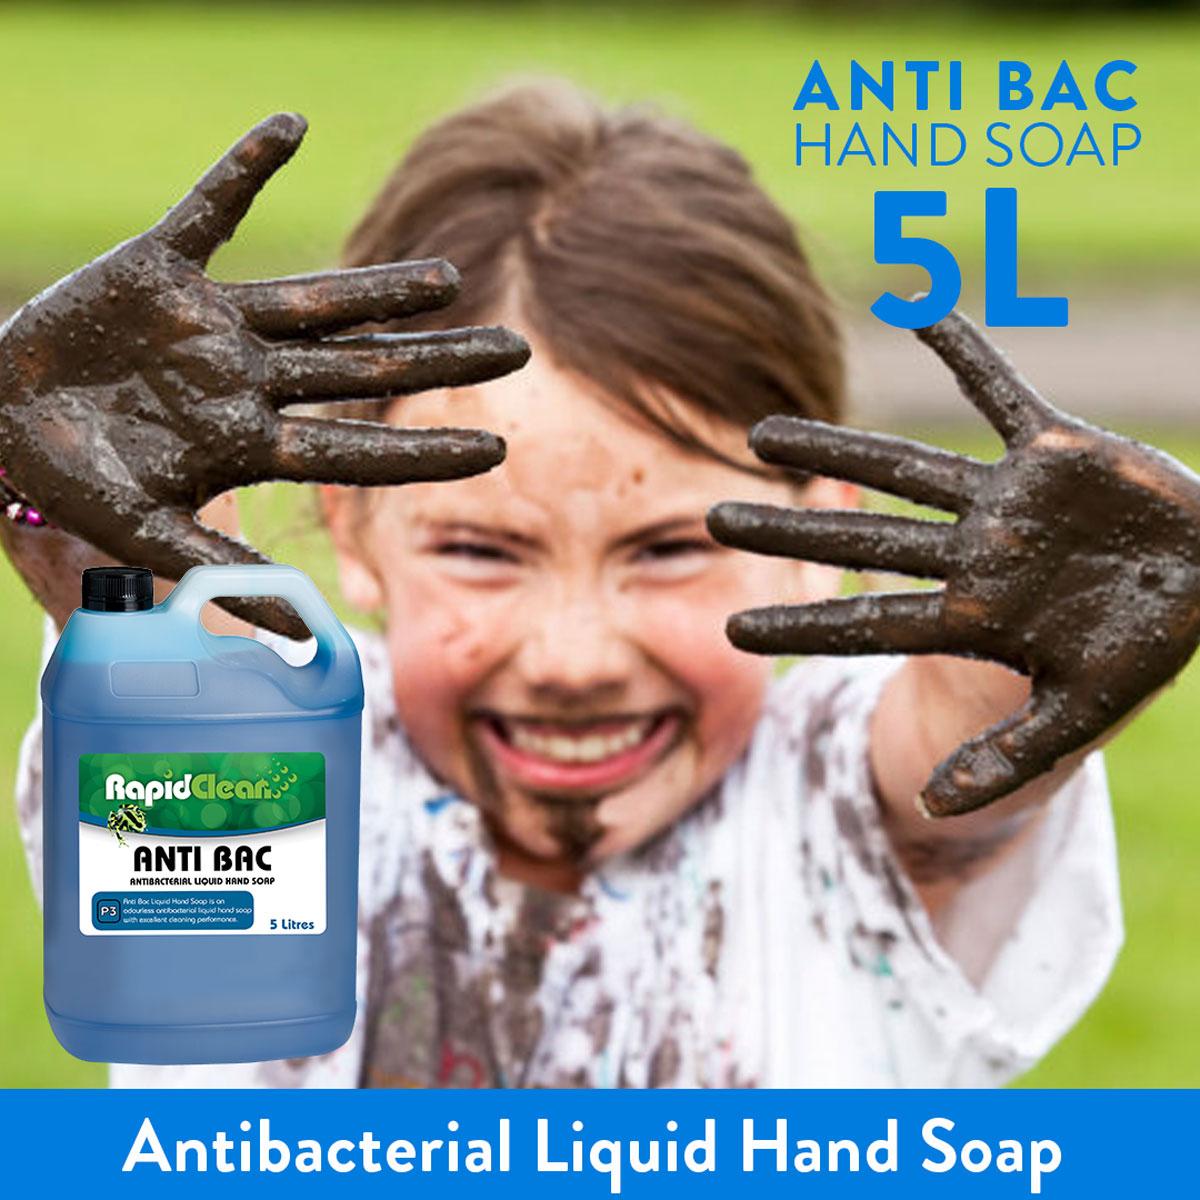 Anti Bac Hand Soap